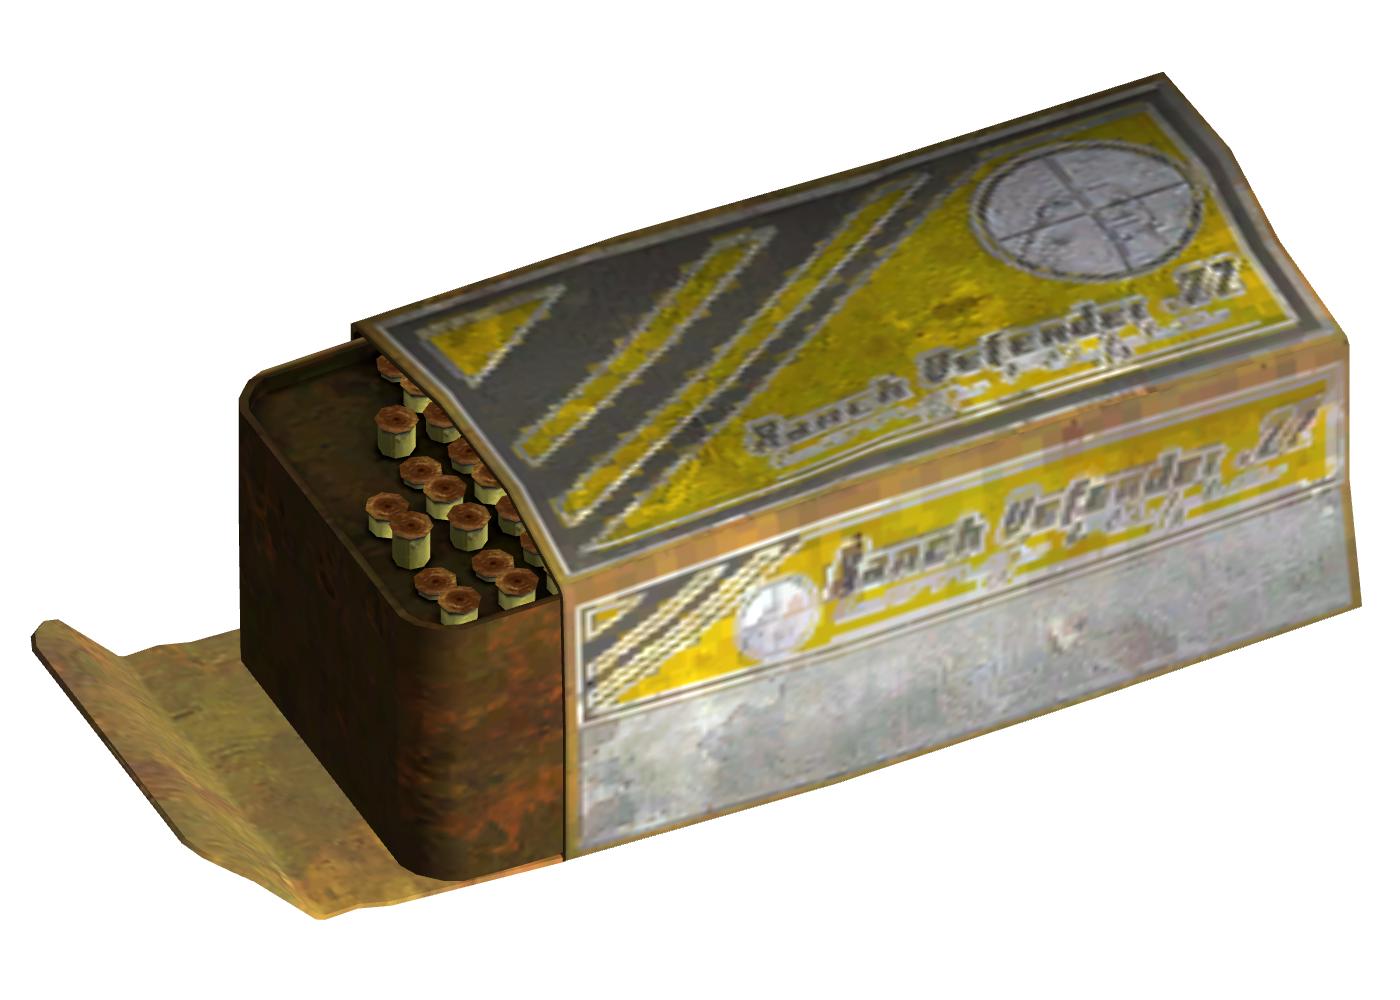 latest?cb=20110213173836 fallout new vegas ammunition fallout wiki fandom powered by wikia fallout 4 how to make a fuse box at readyjetset.co